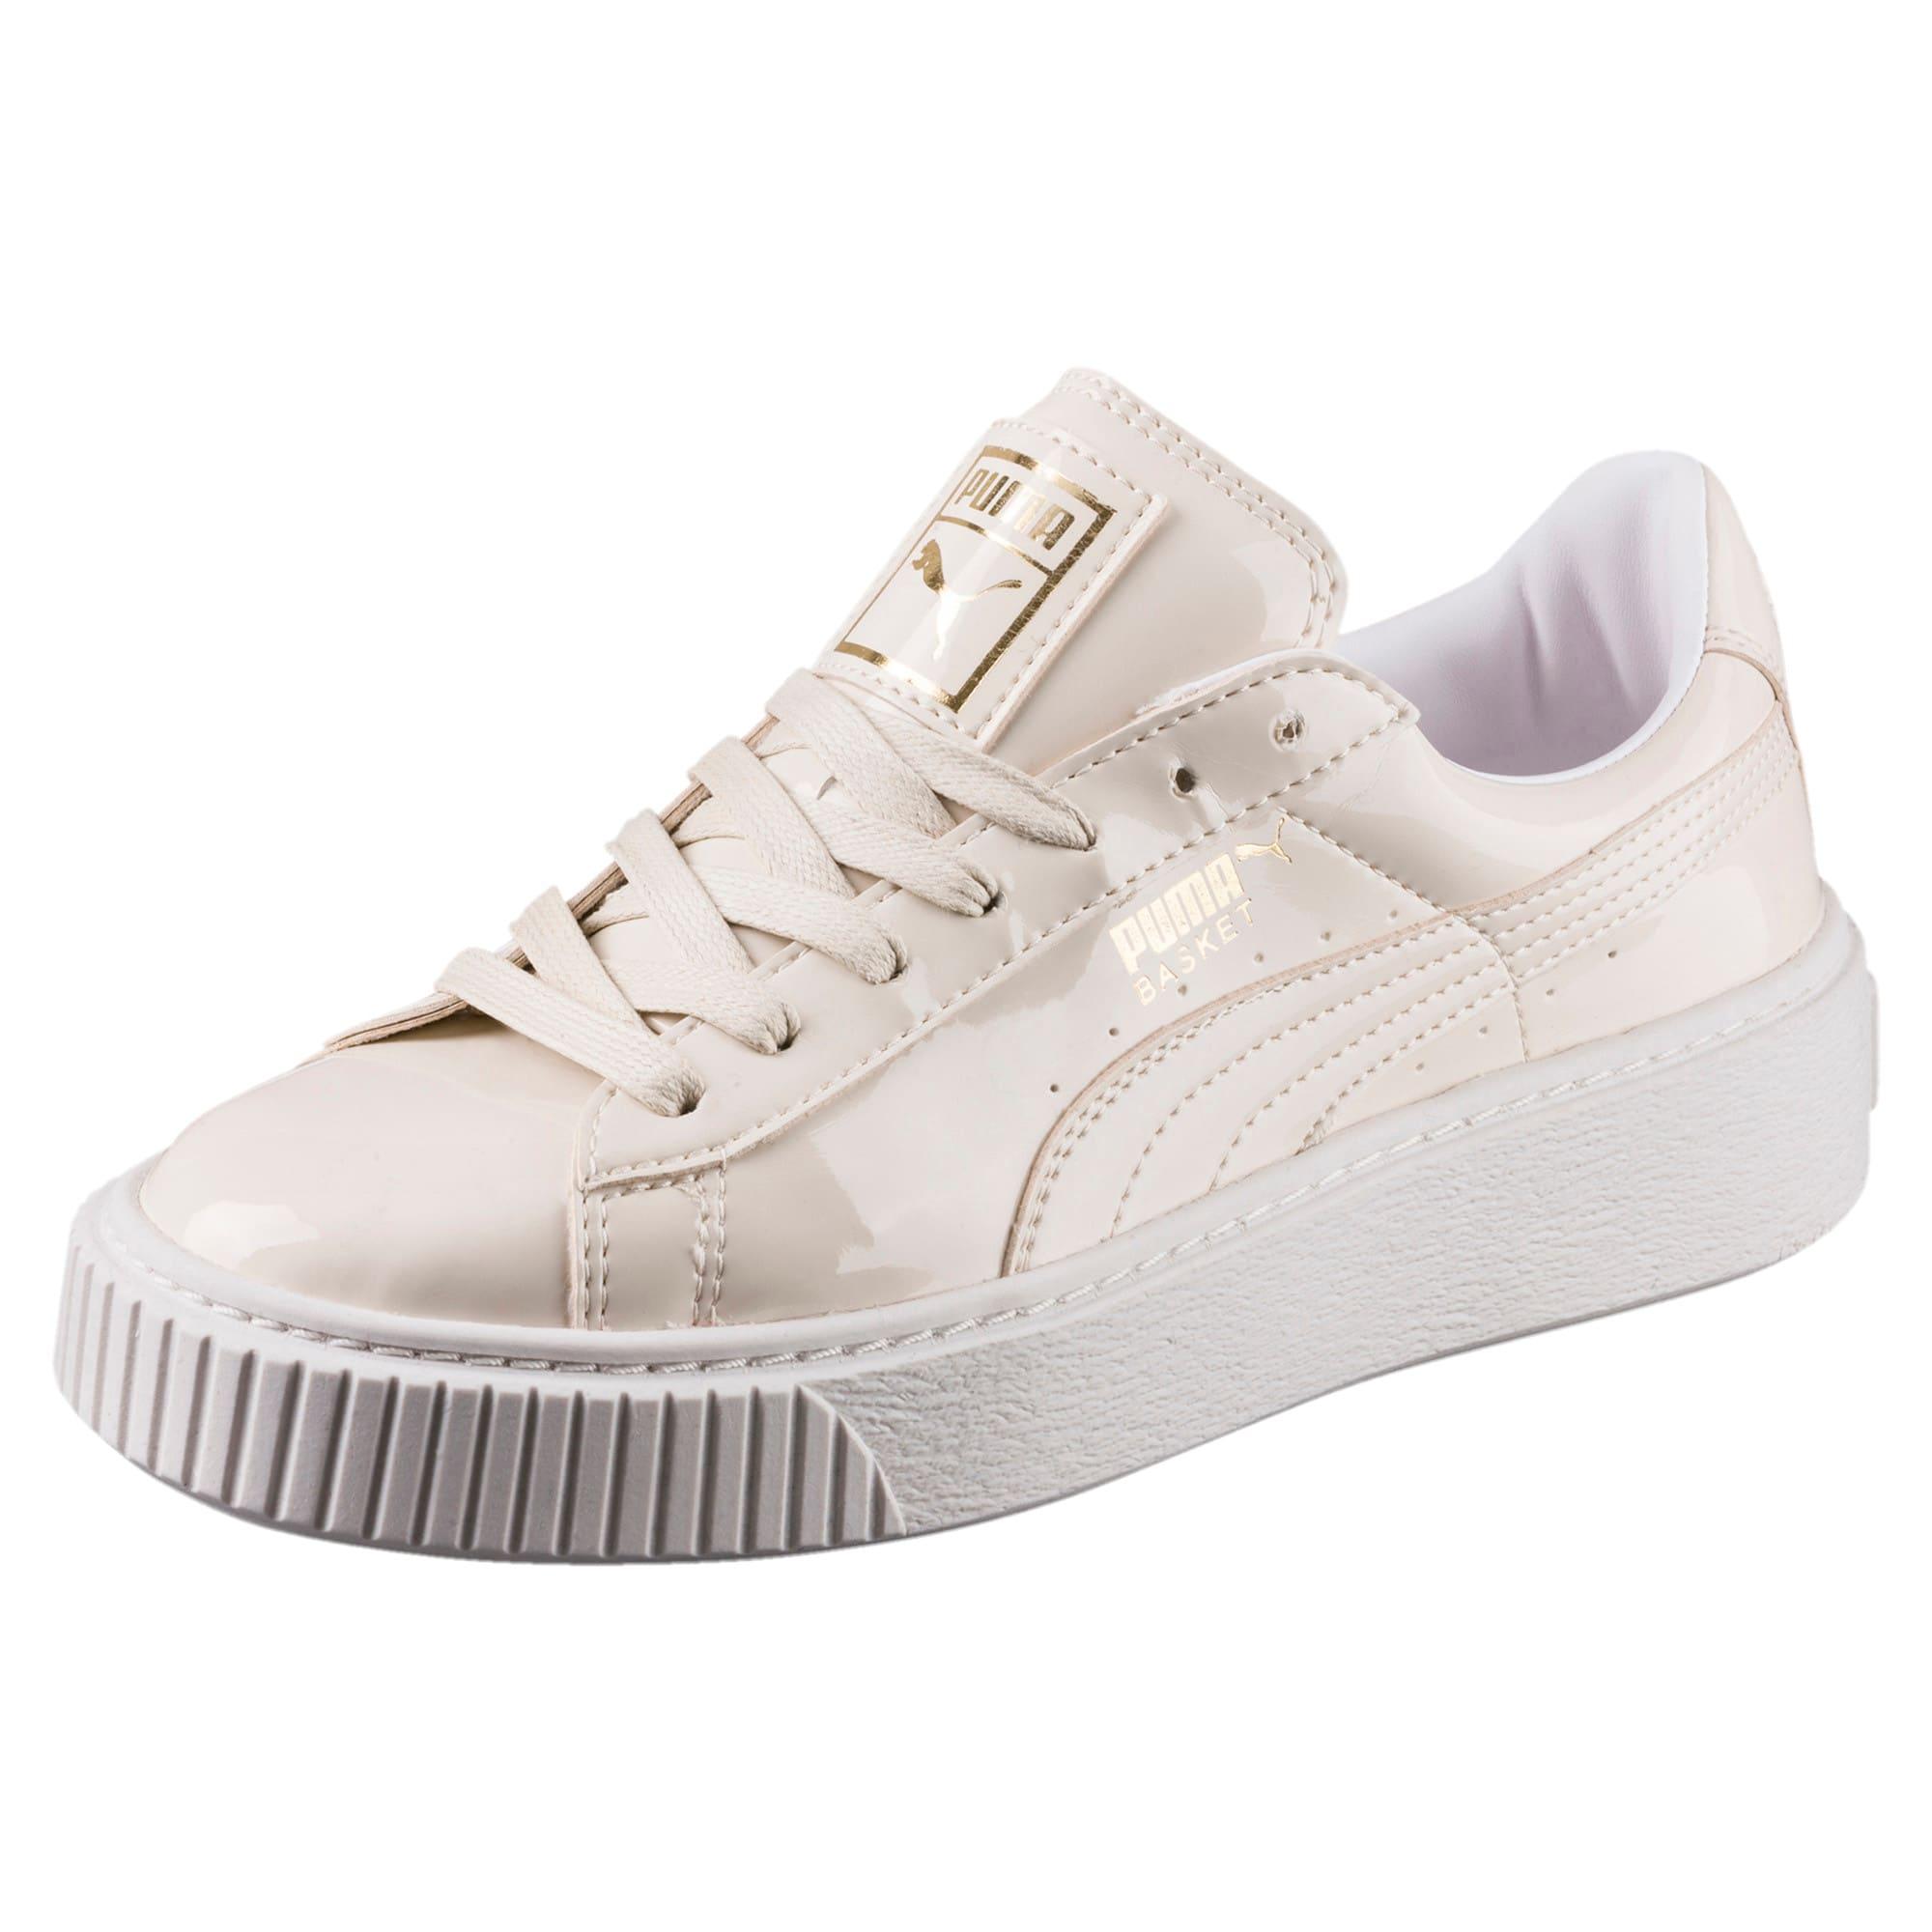 Basket Platform Patent Women's Sneakers